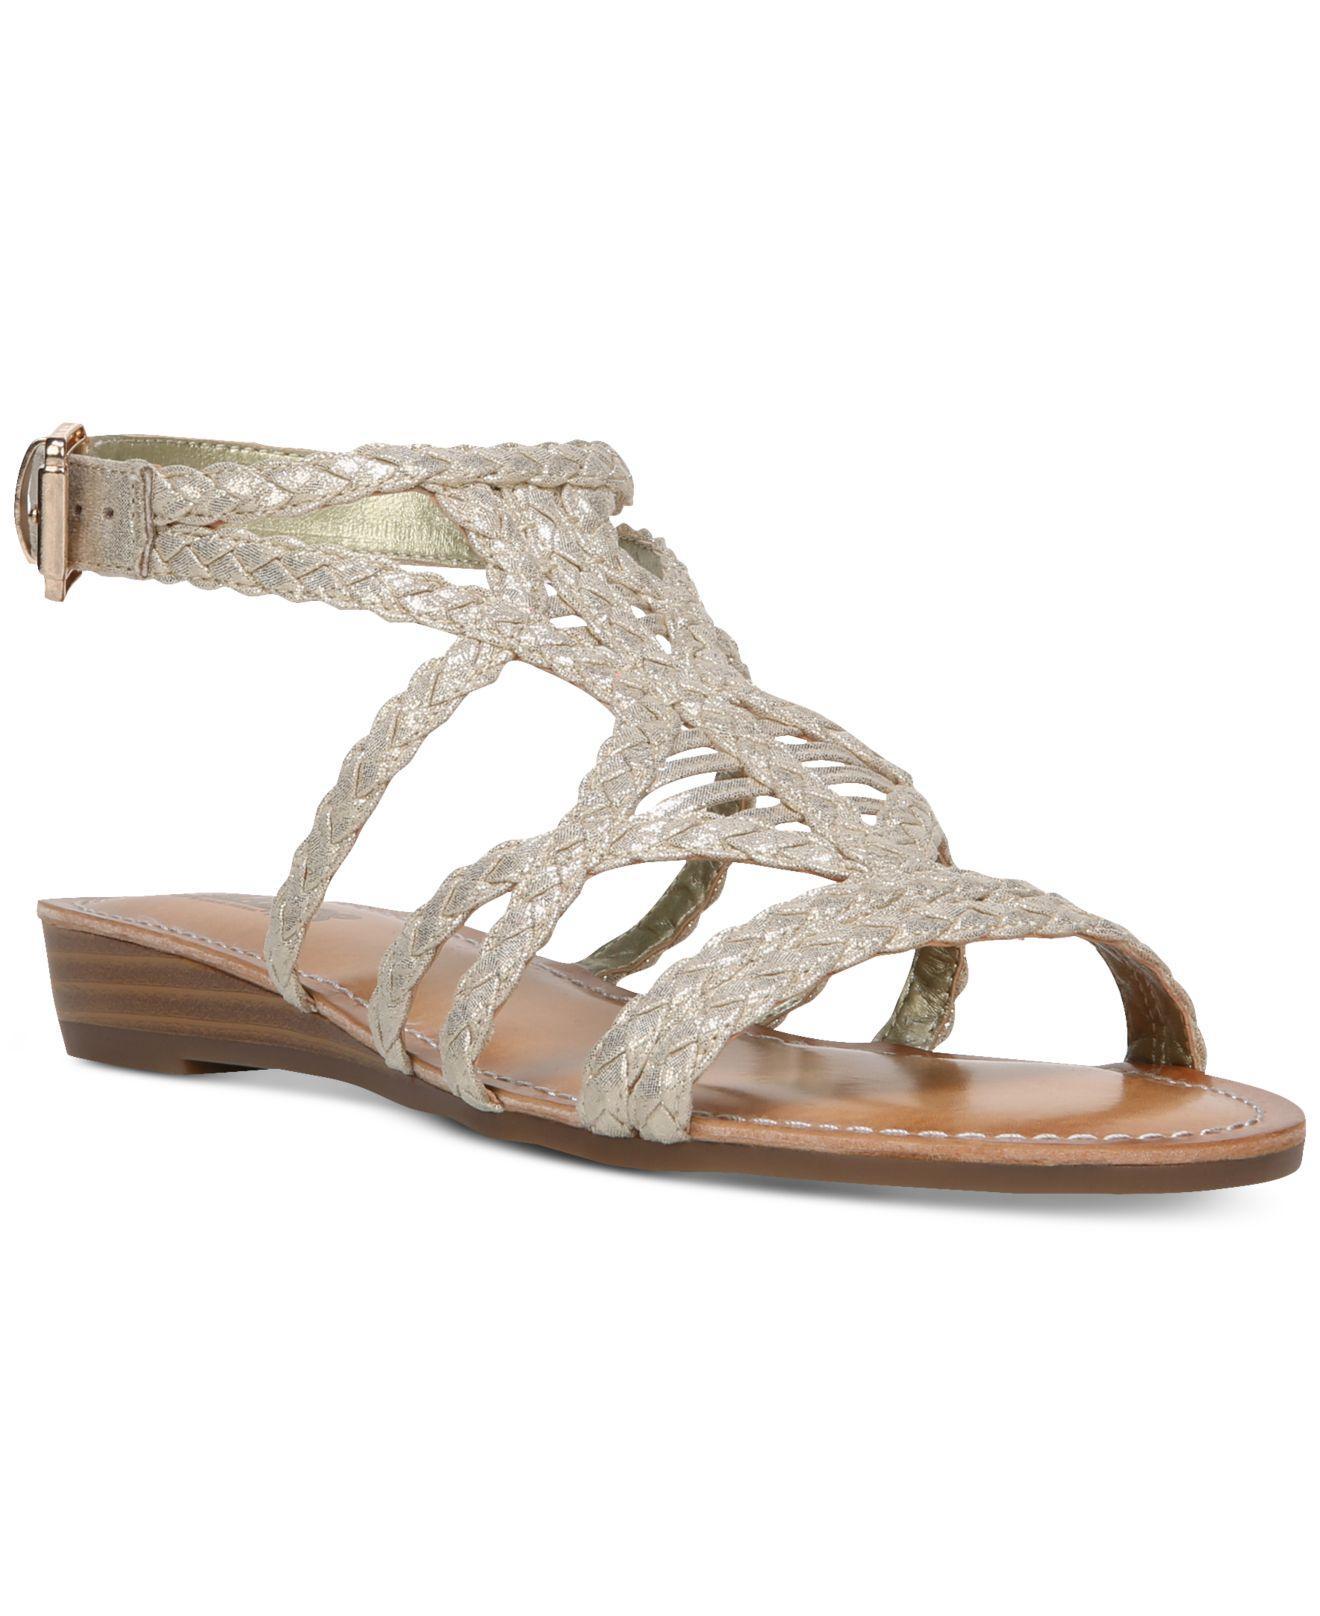 Rachel Roy Shoes Uk